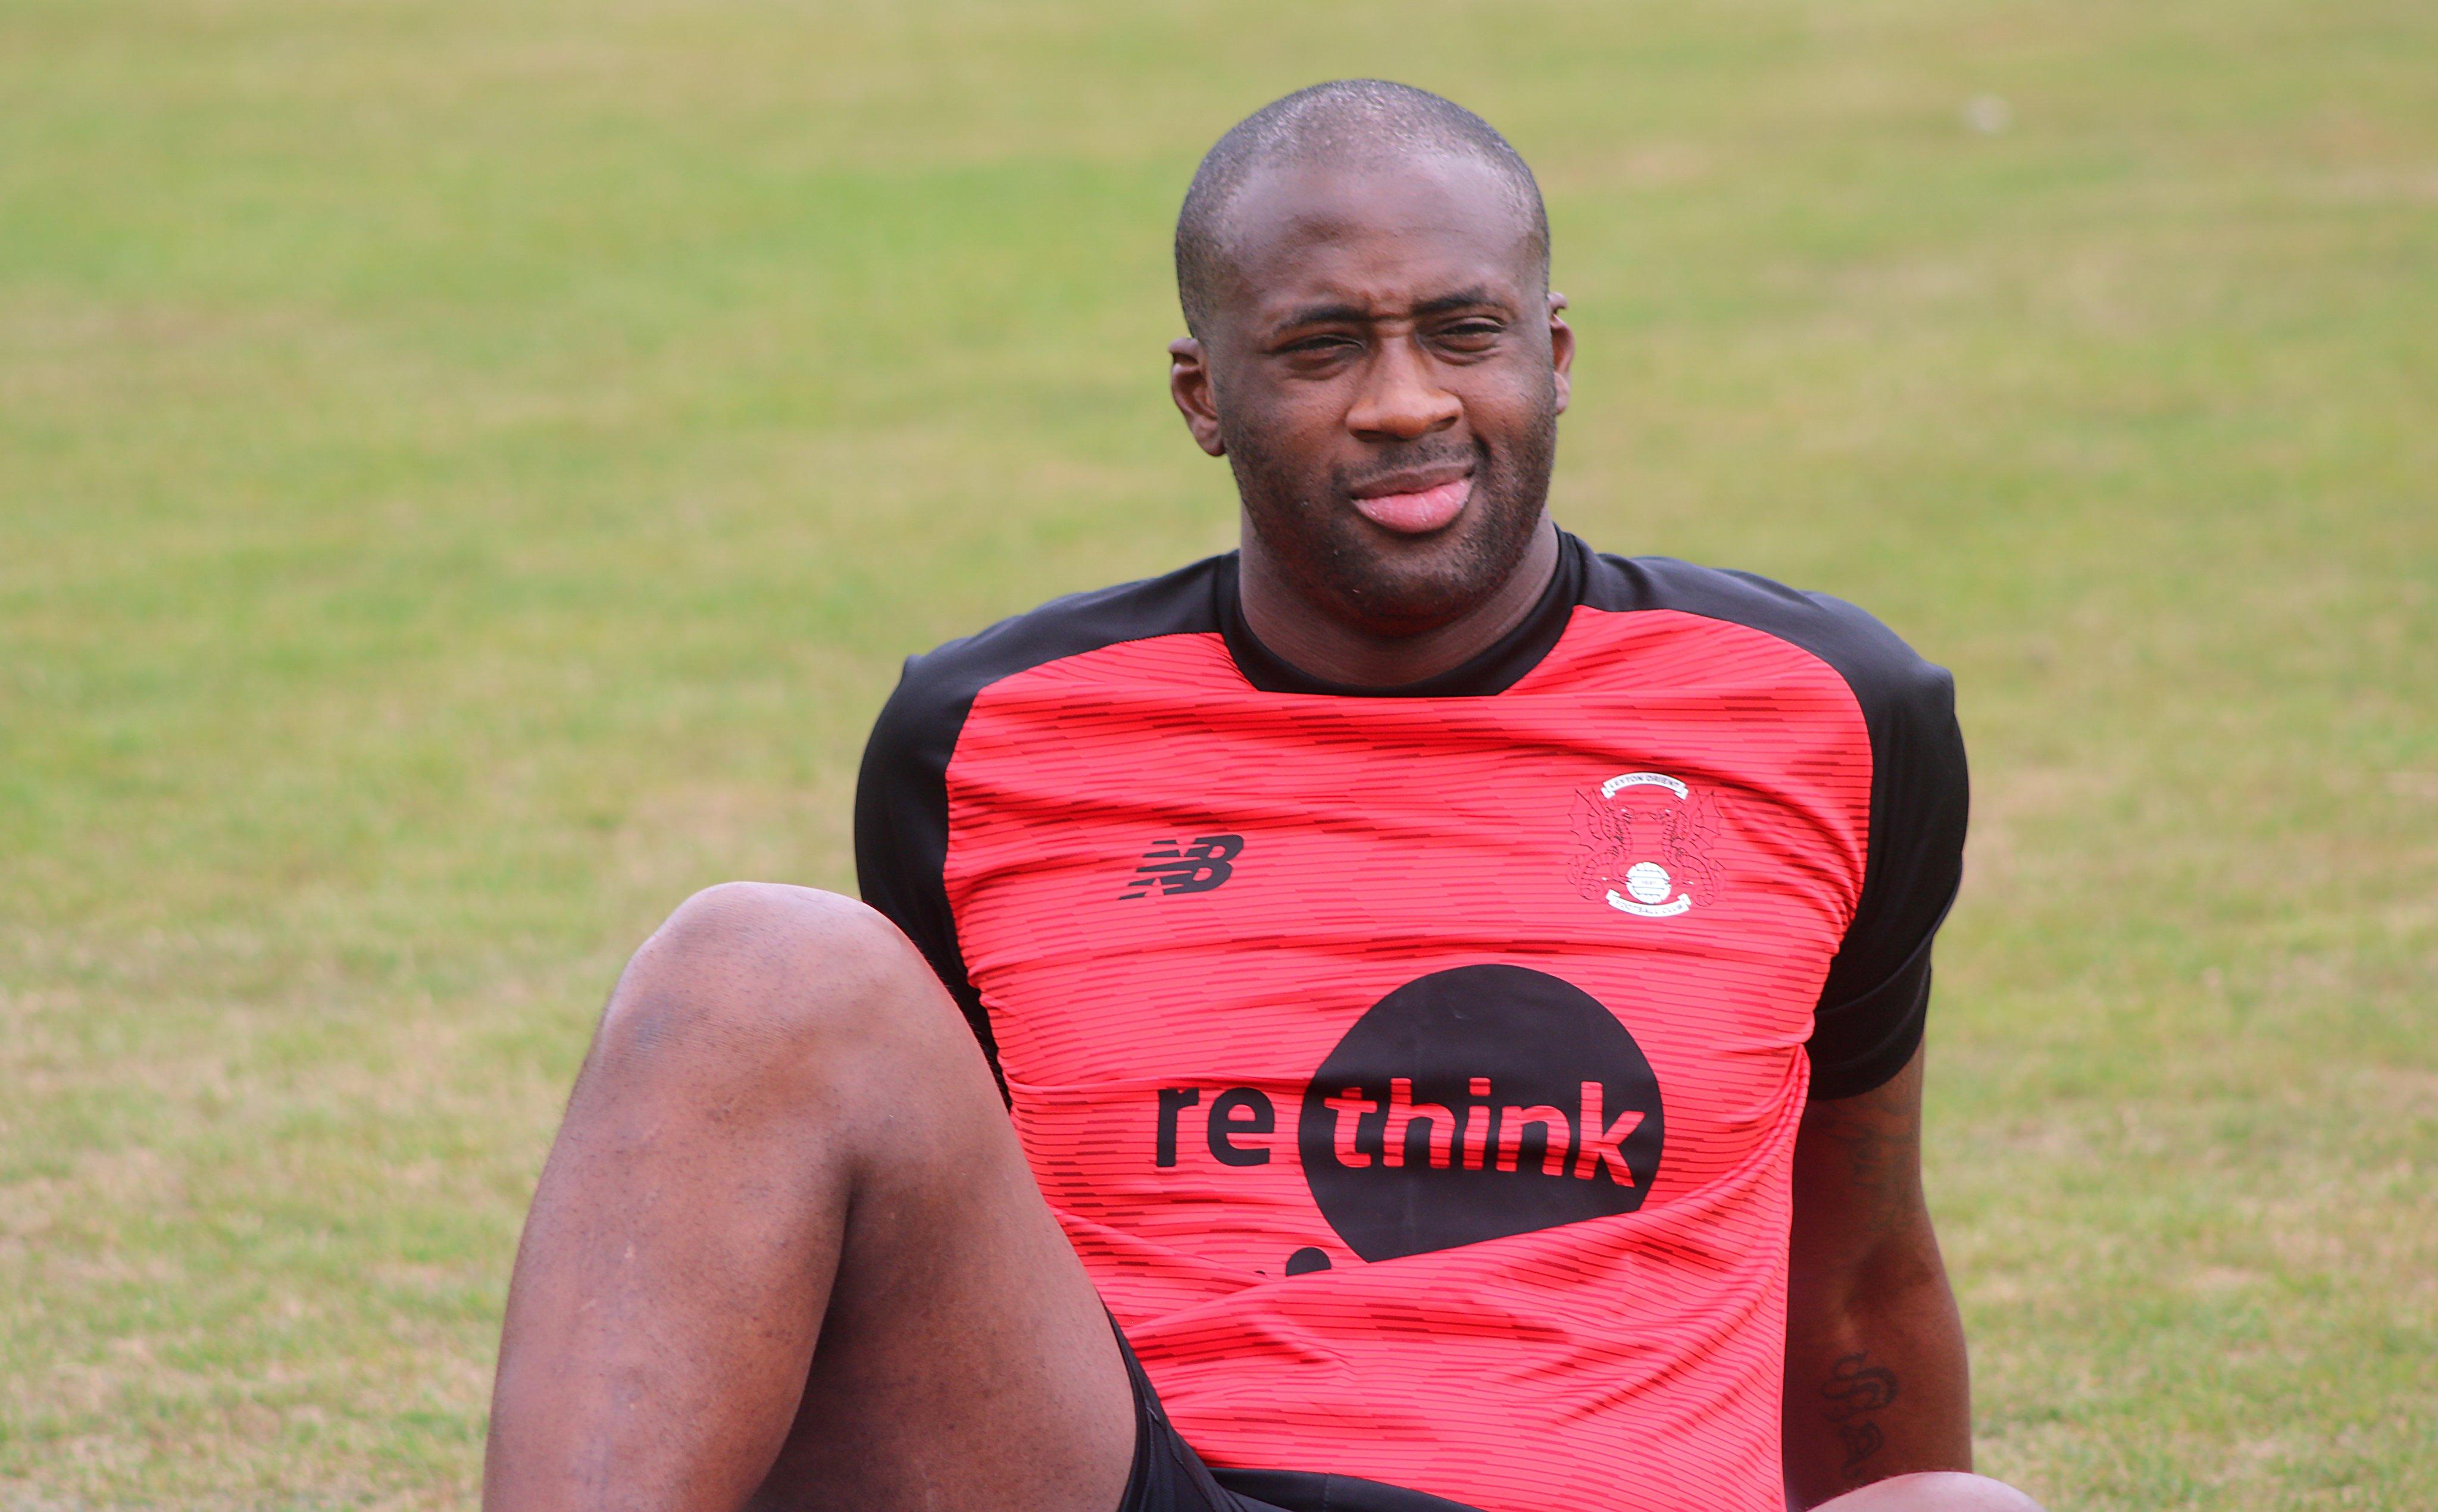 Ex-Barcelona, Man City star Yaya Toure training with Leyton Orient